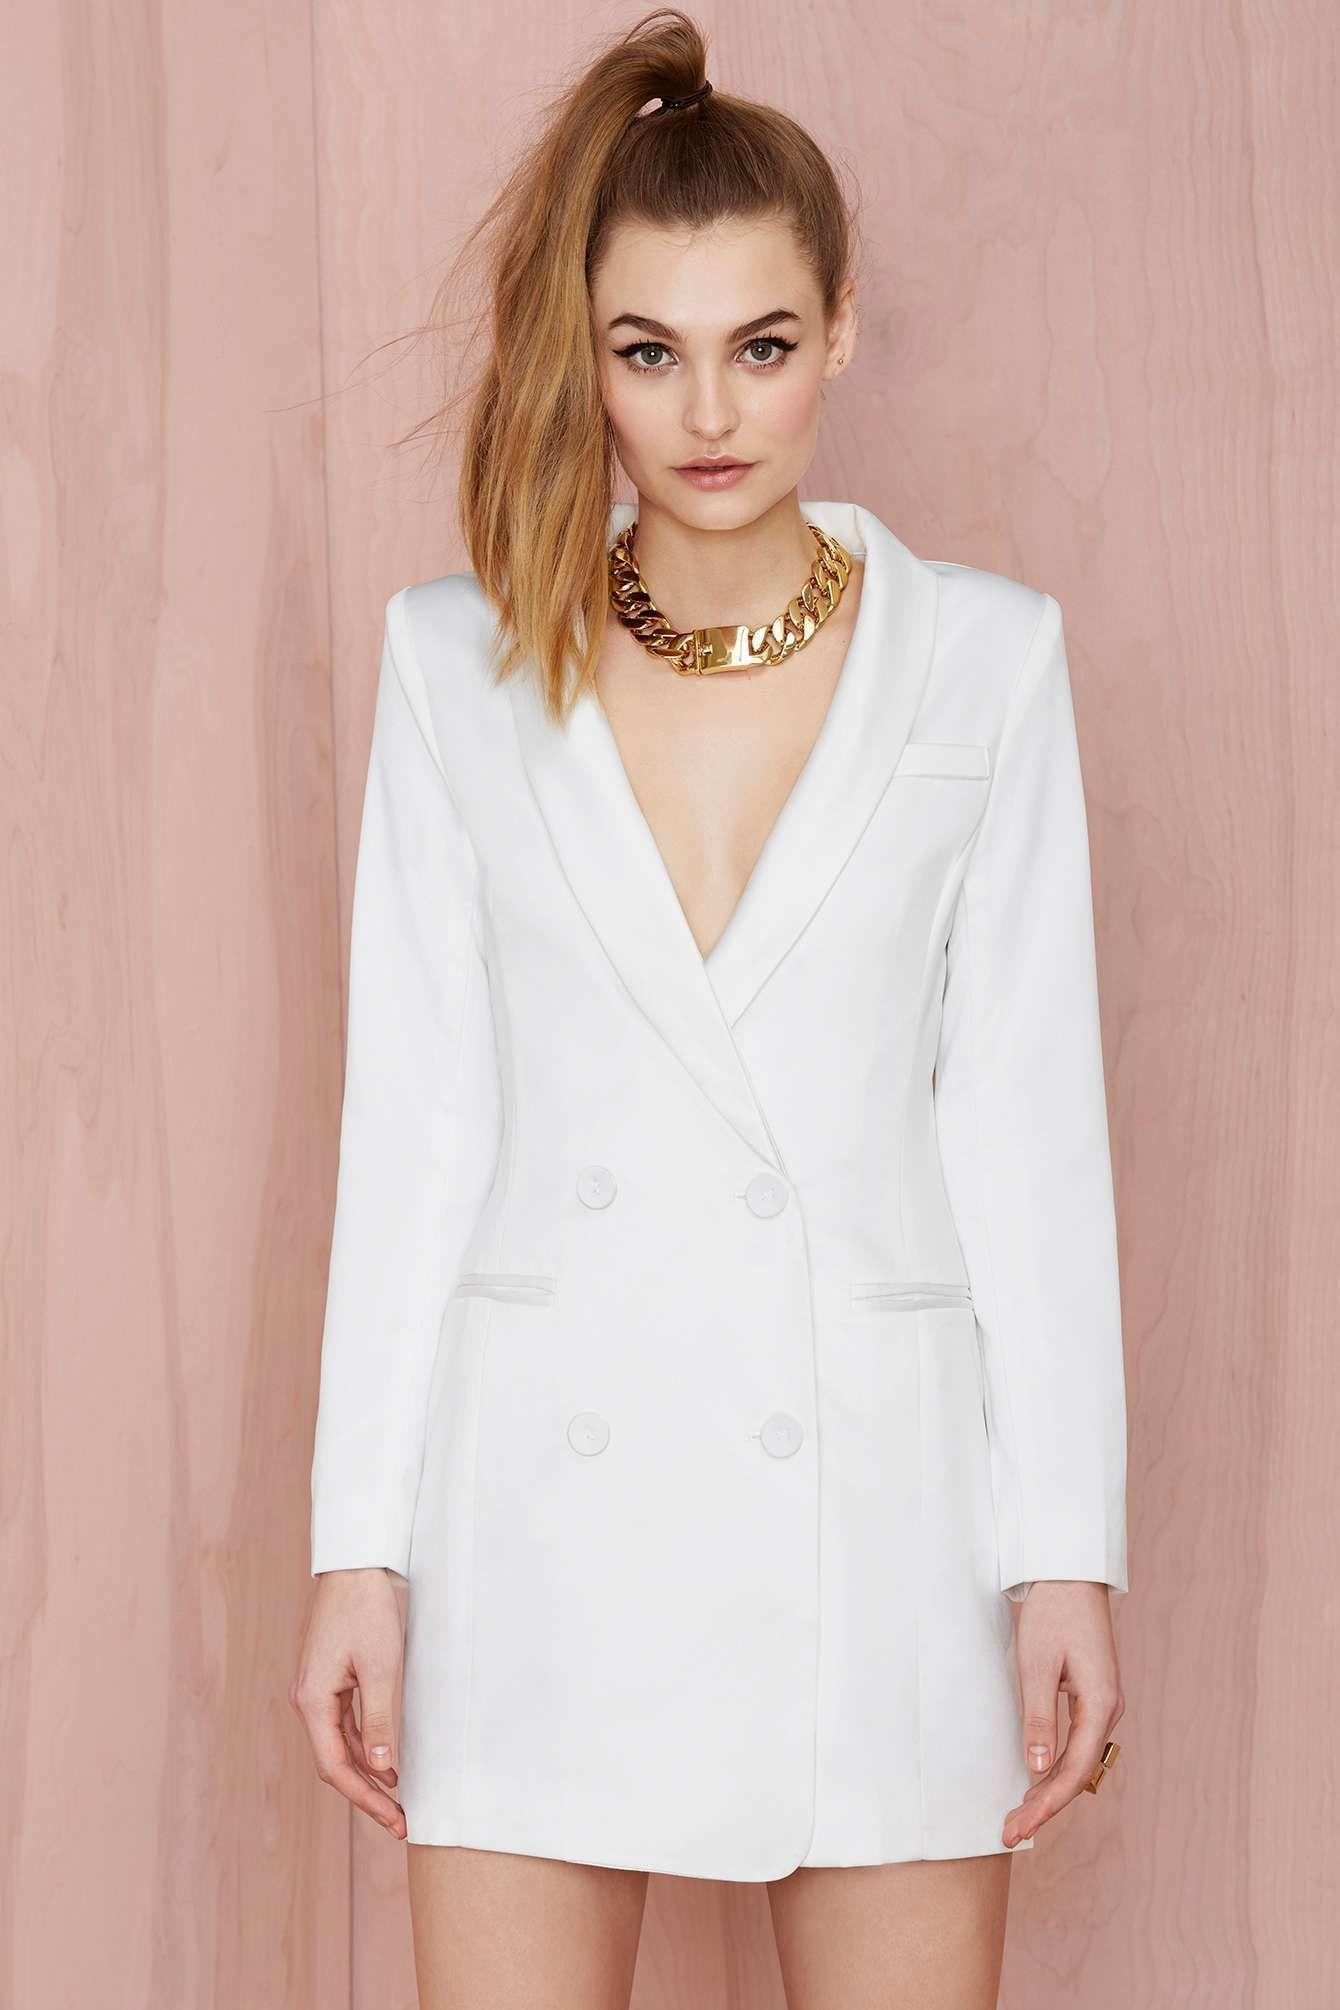 Line Dot Angelina Tuxedo Dress White Tuxedo Dress Tuxedo Dress White Women Dress Online [ 2010 x 1340 Pixel ]